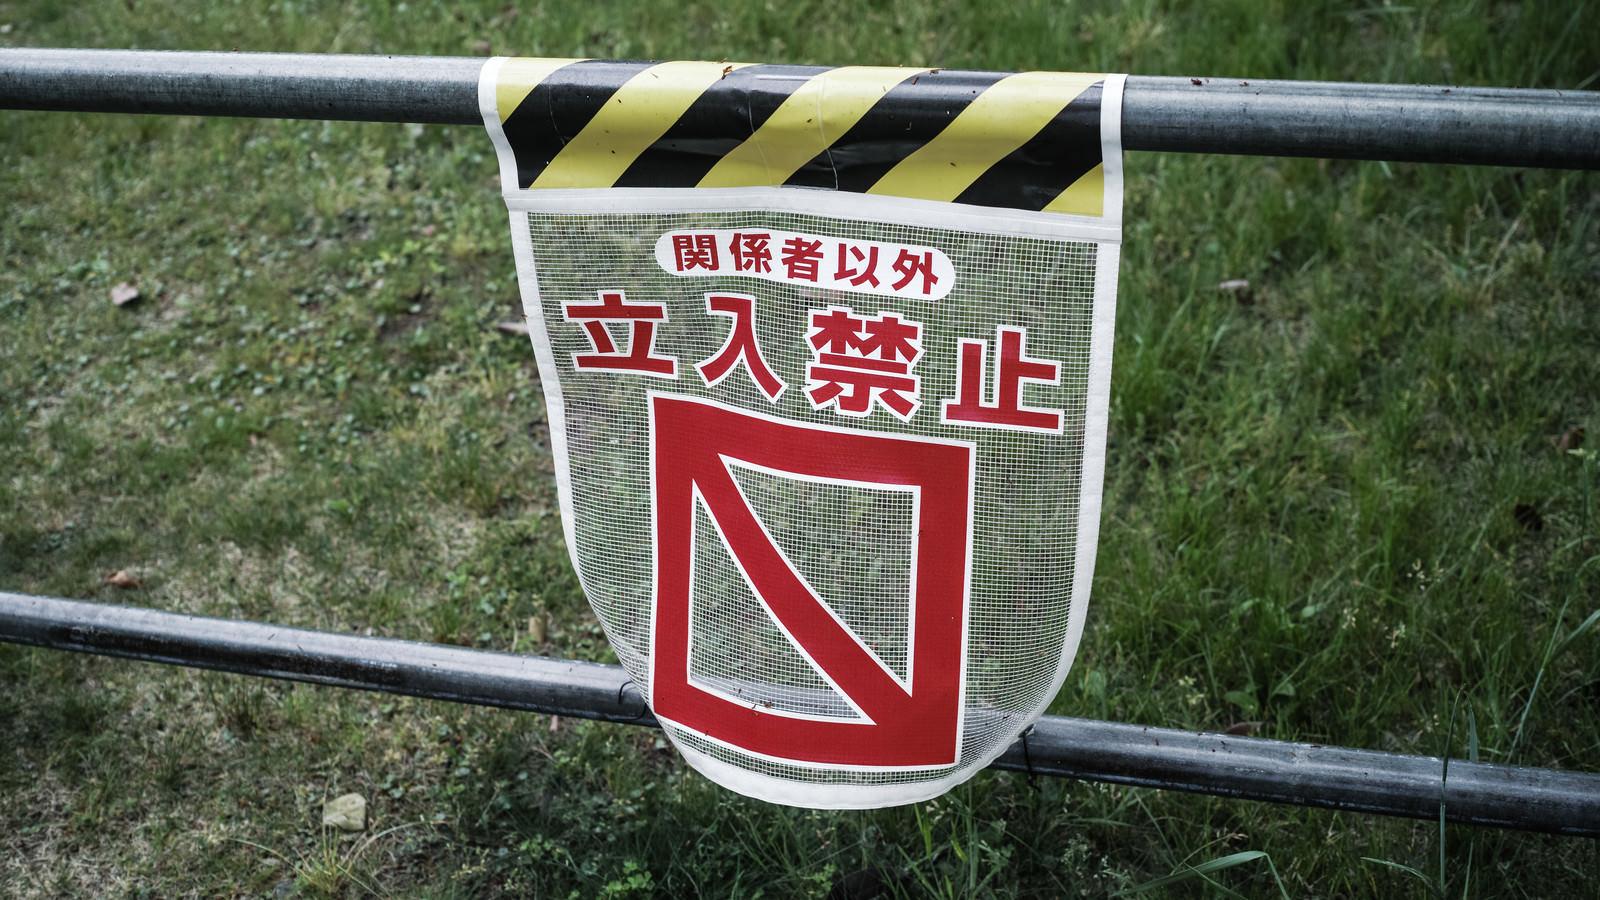 「関係者以外立入禁止」の写真